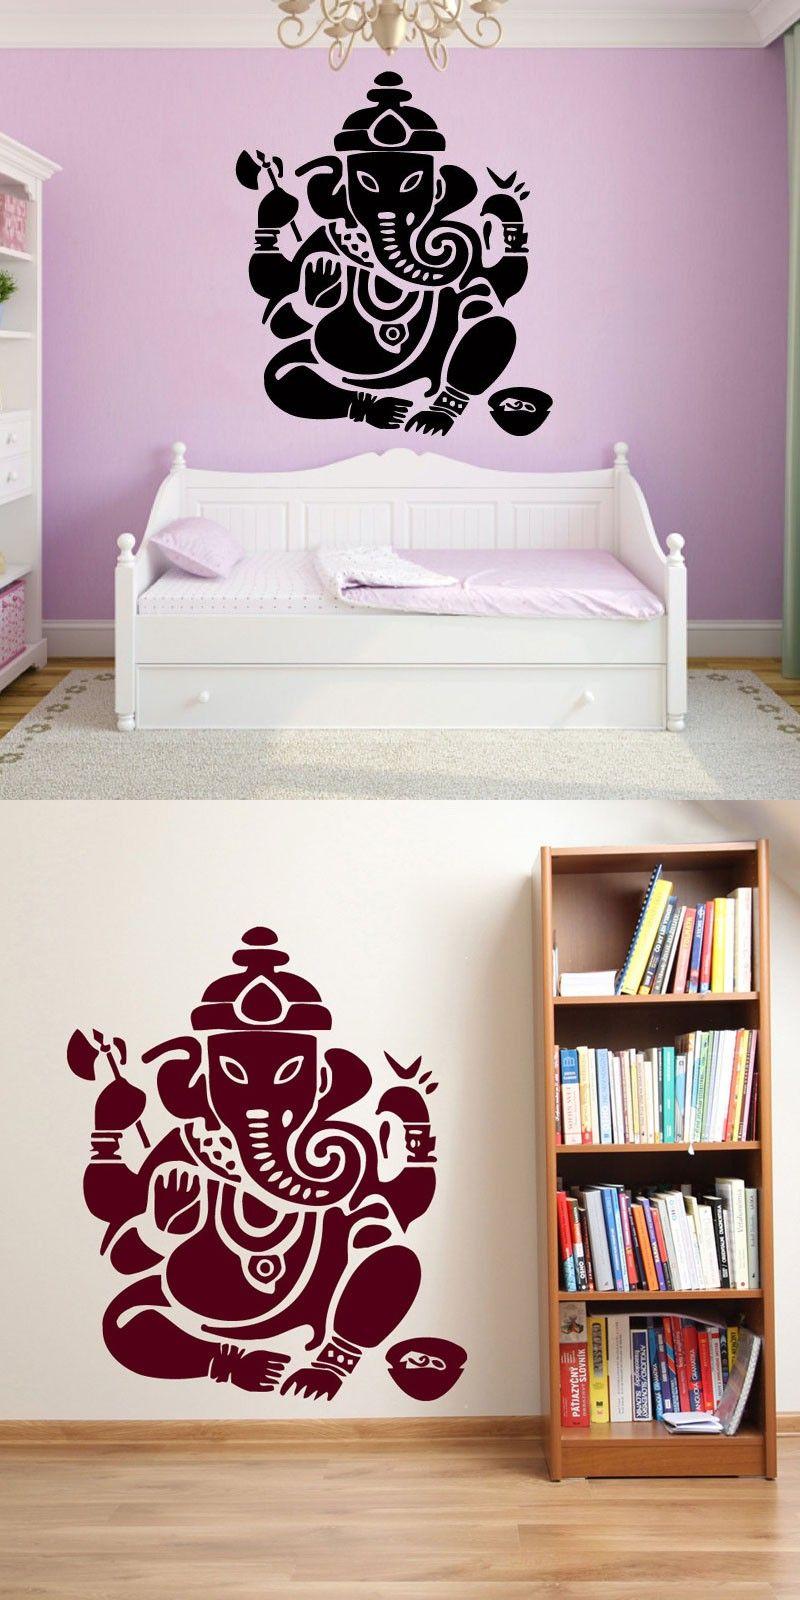 Ganesha Lord Wall Stickers Indian Elephant Modern Home Decor ...